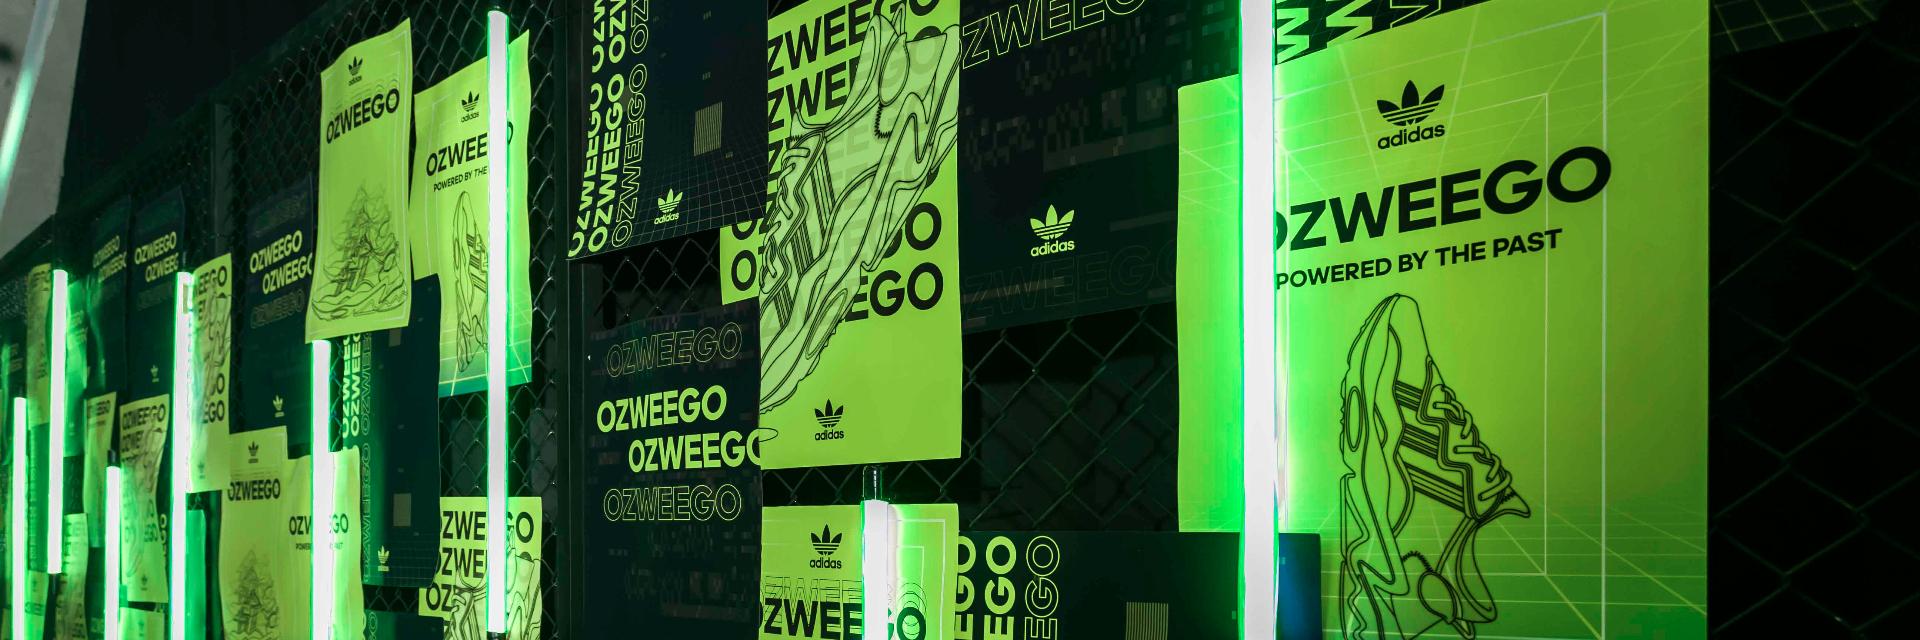 【現場直擊】今年八月最強潮流盛事!adidas Originals OZWEEGO帶你進化OZ世代!